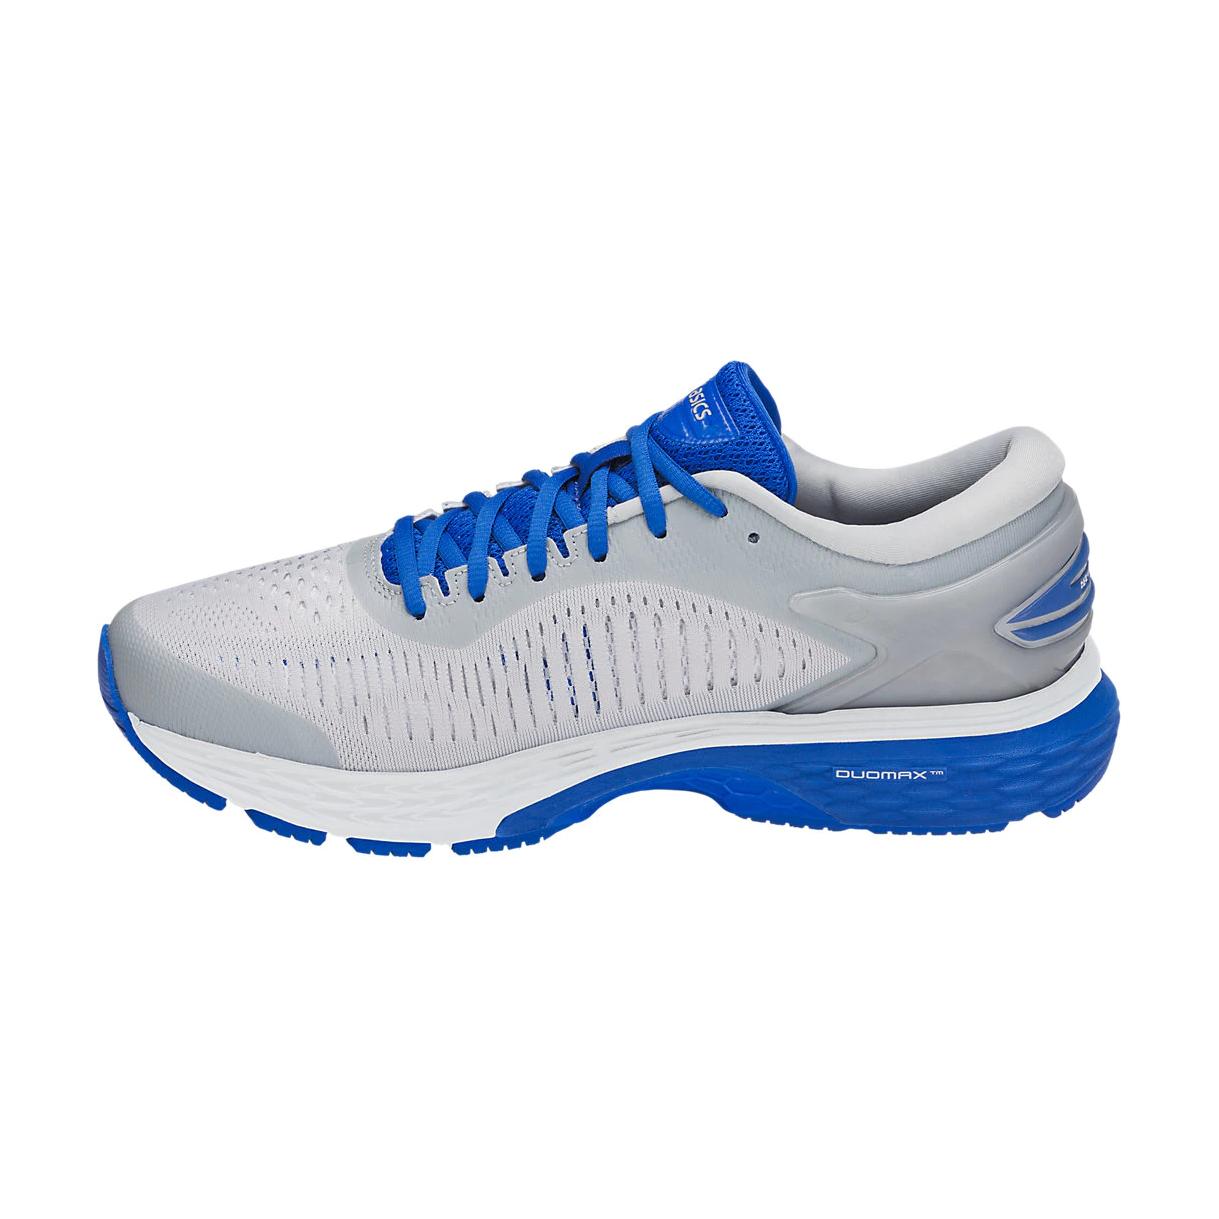 73c4e50bad Asics Men's Gel-Kayano 25 Lite Show Running Shoe - Mid Grey/Illusion Blue